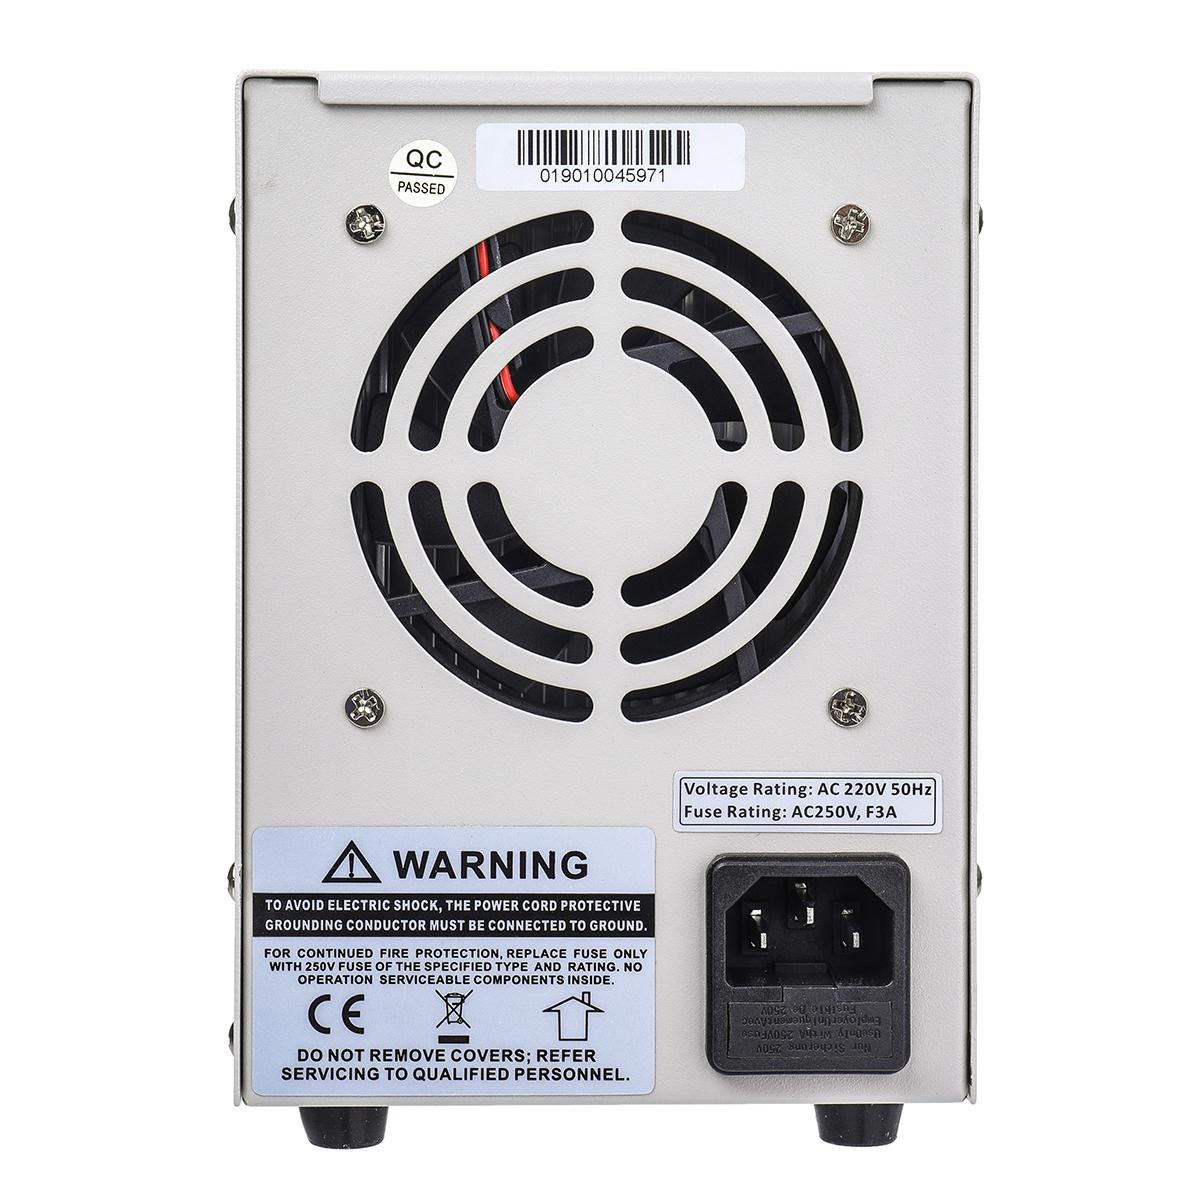 Laboratory-DC-Bench-Power-Supply-Variable-Benchtop-0-30V-0-5A-LCD-Display thumbnail 5